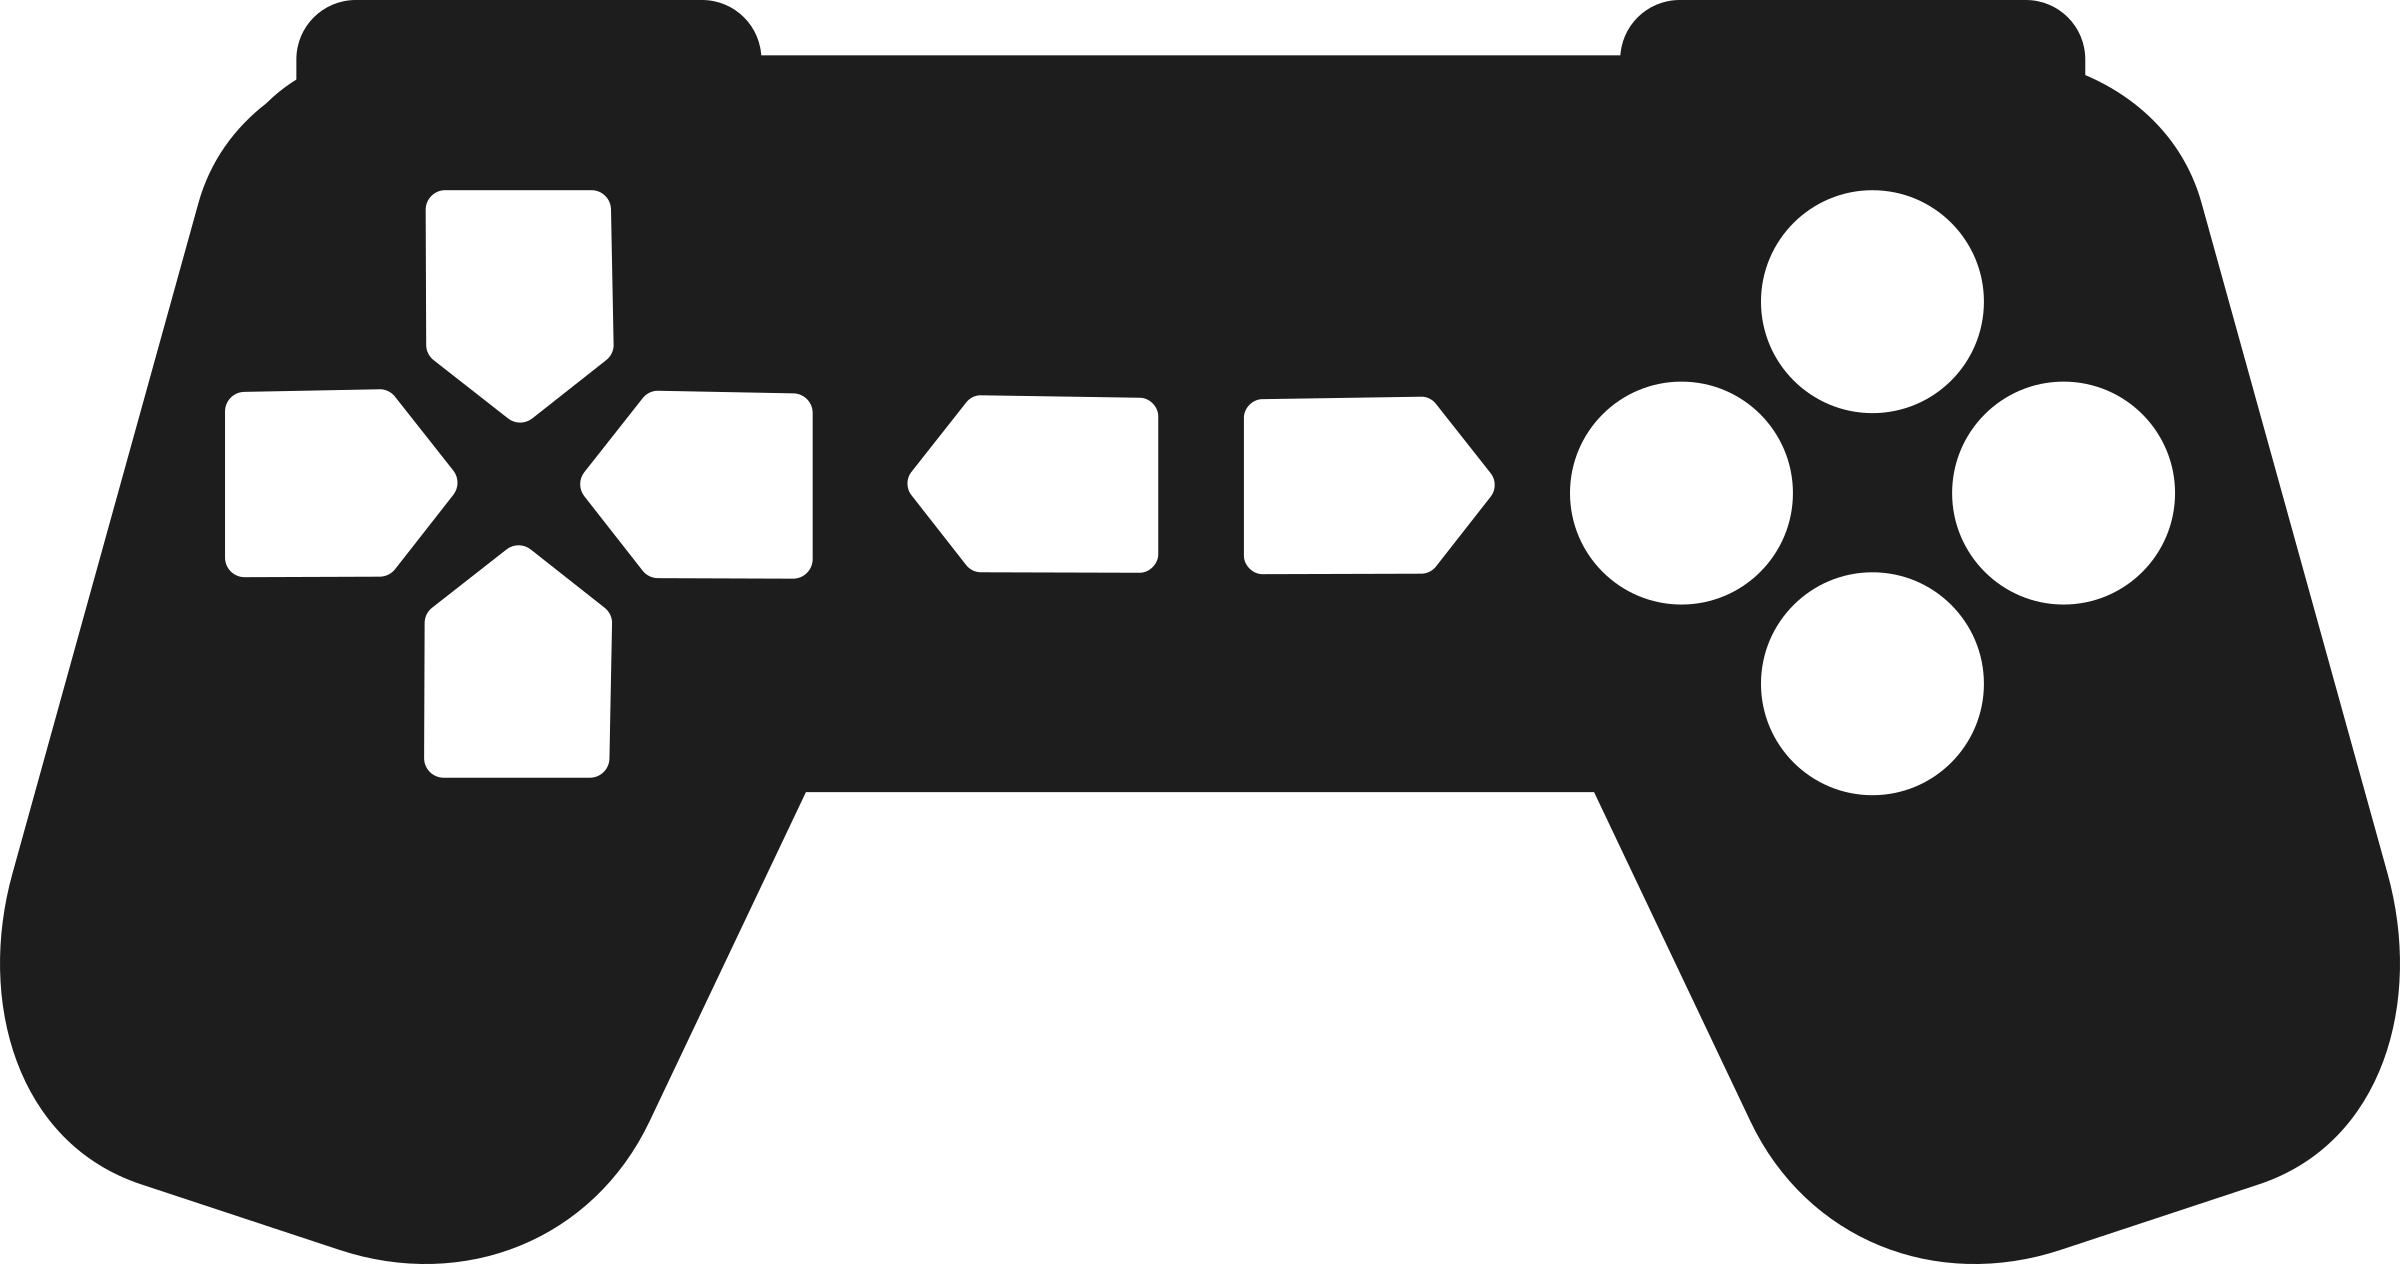 2400x1264 Controller Games Clipart, Explore Pictures